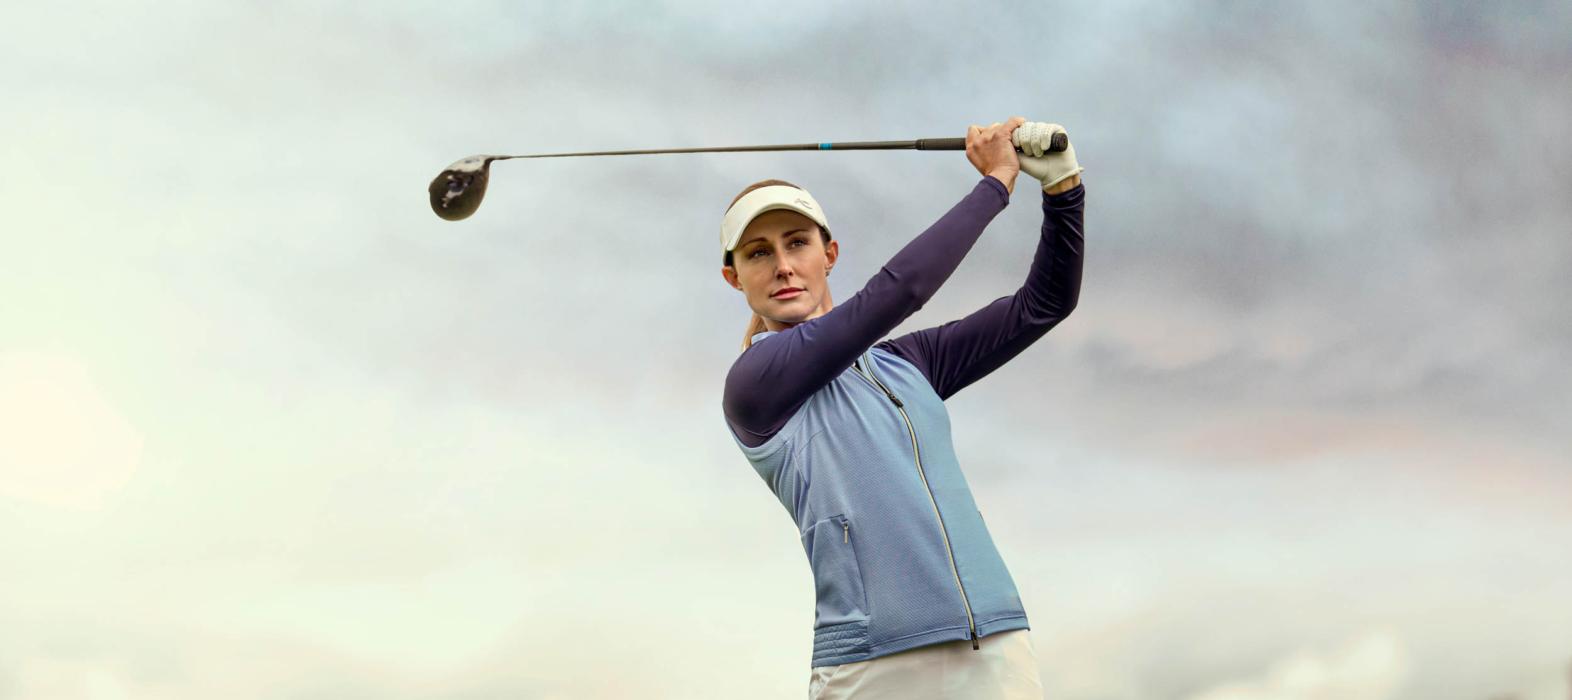 A woman golfing wearing KJUS apparel - lifestyle photography